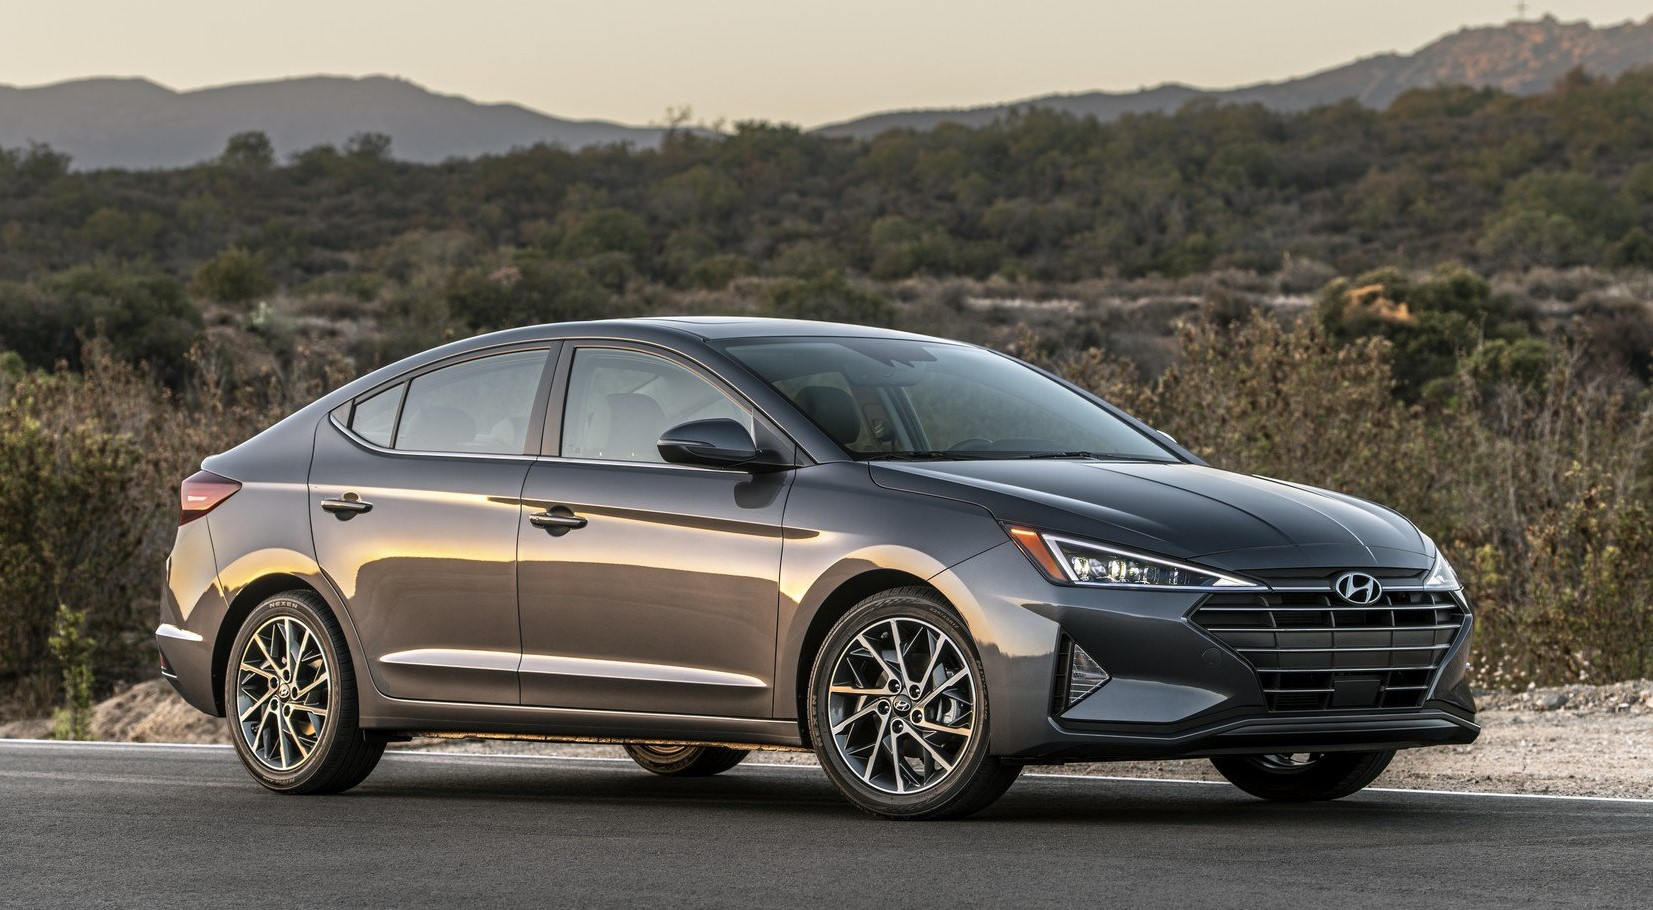 2019 Hyundai Elantra front look